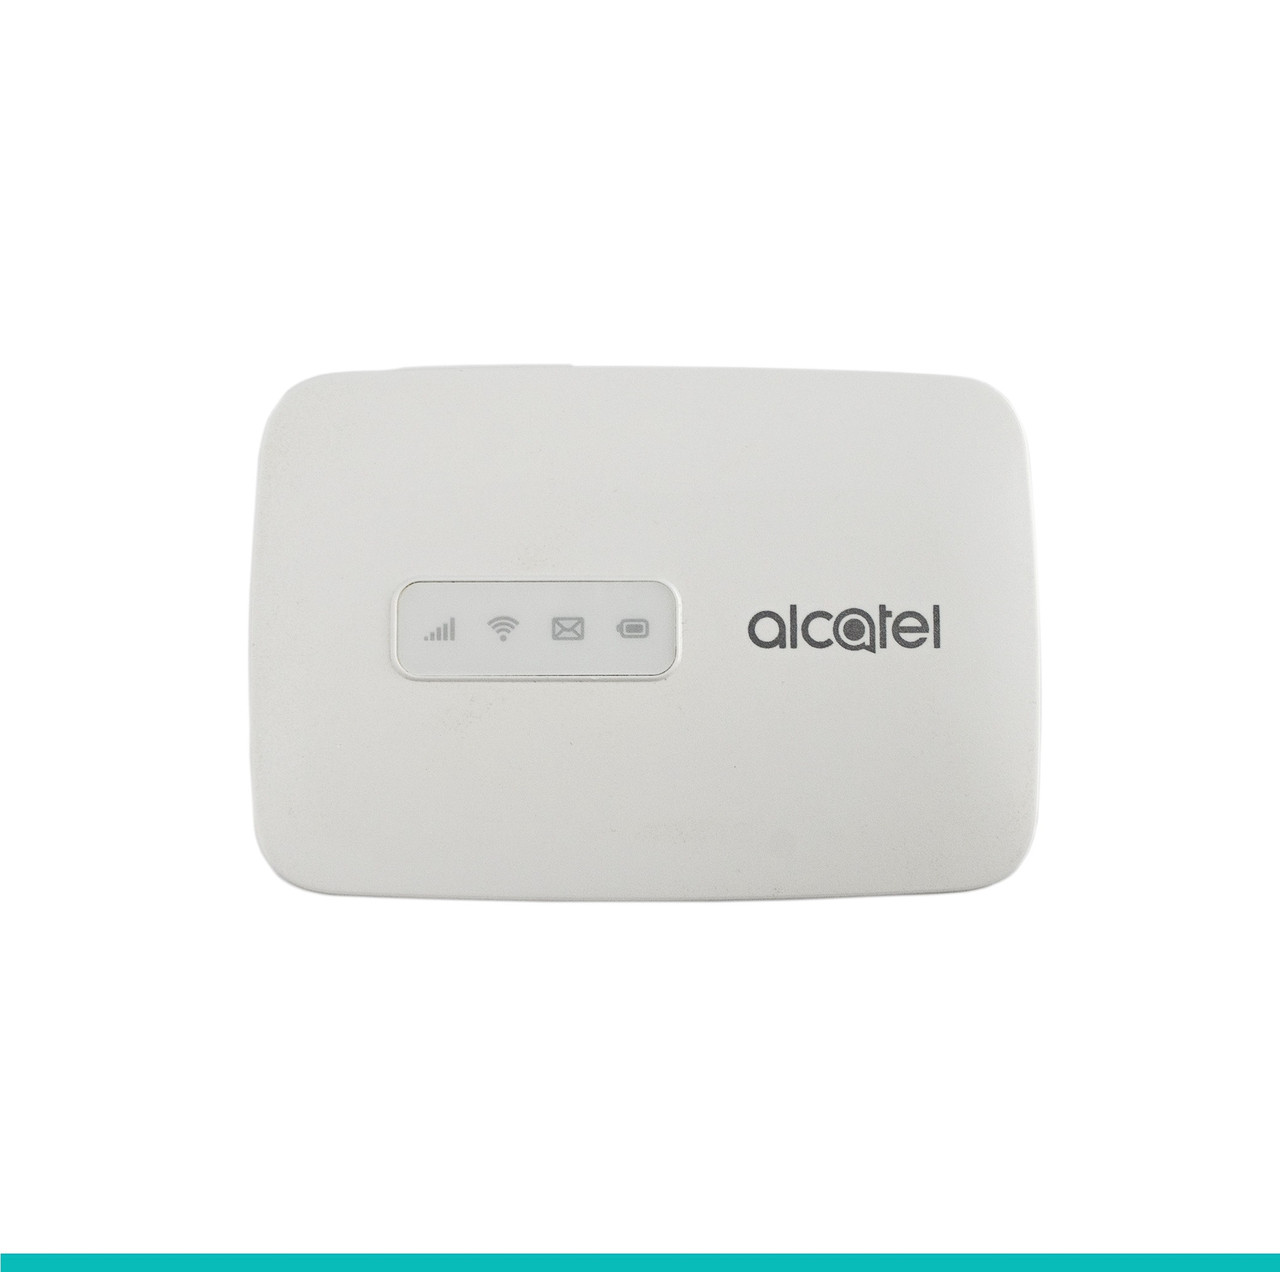 4G LTE Wi-Fi роутер Alcatel MW40V-2BSFFR1 (Киевстар, Vodafone, Lifecell) Уценка